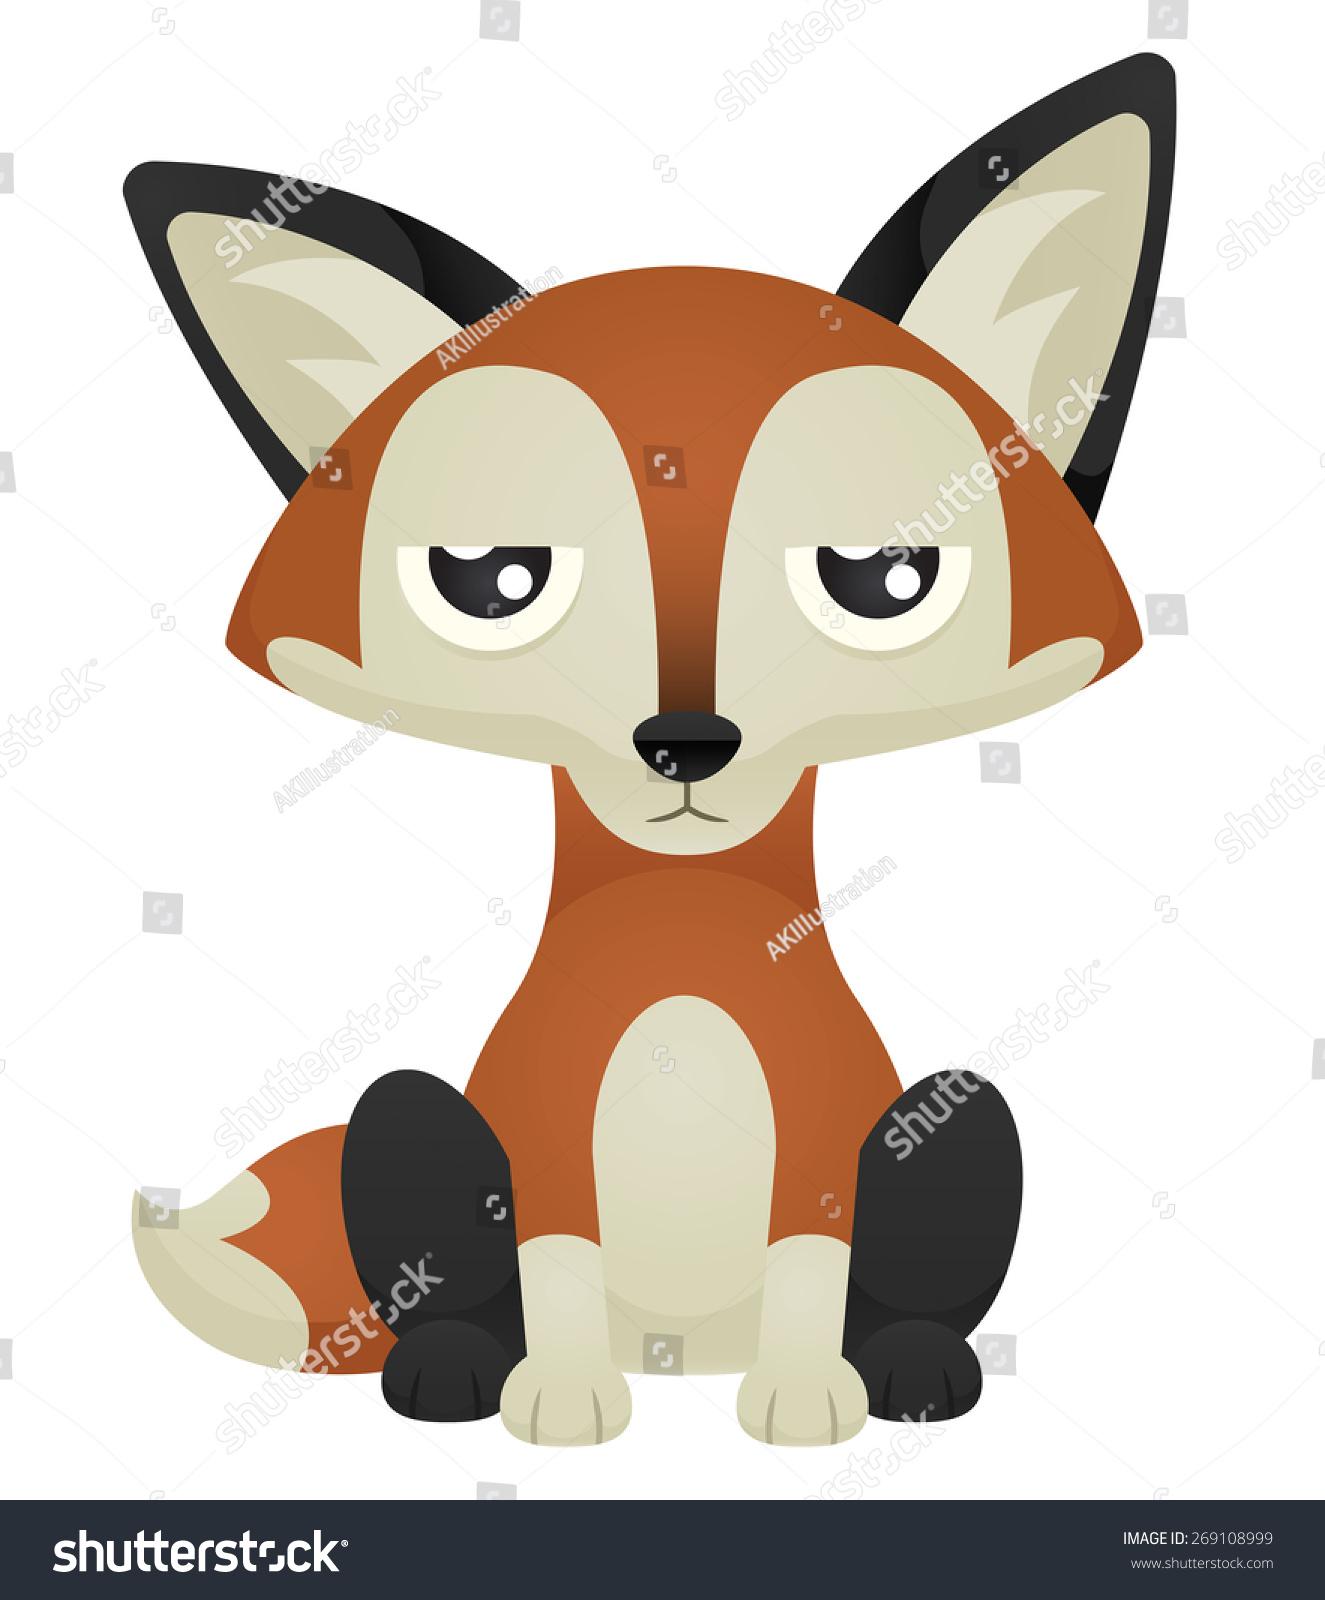 Sitting fox illustration - photo#23